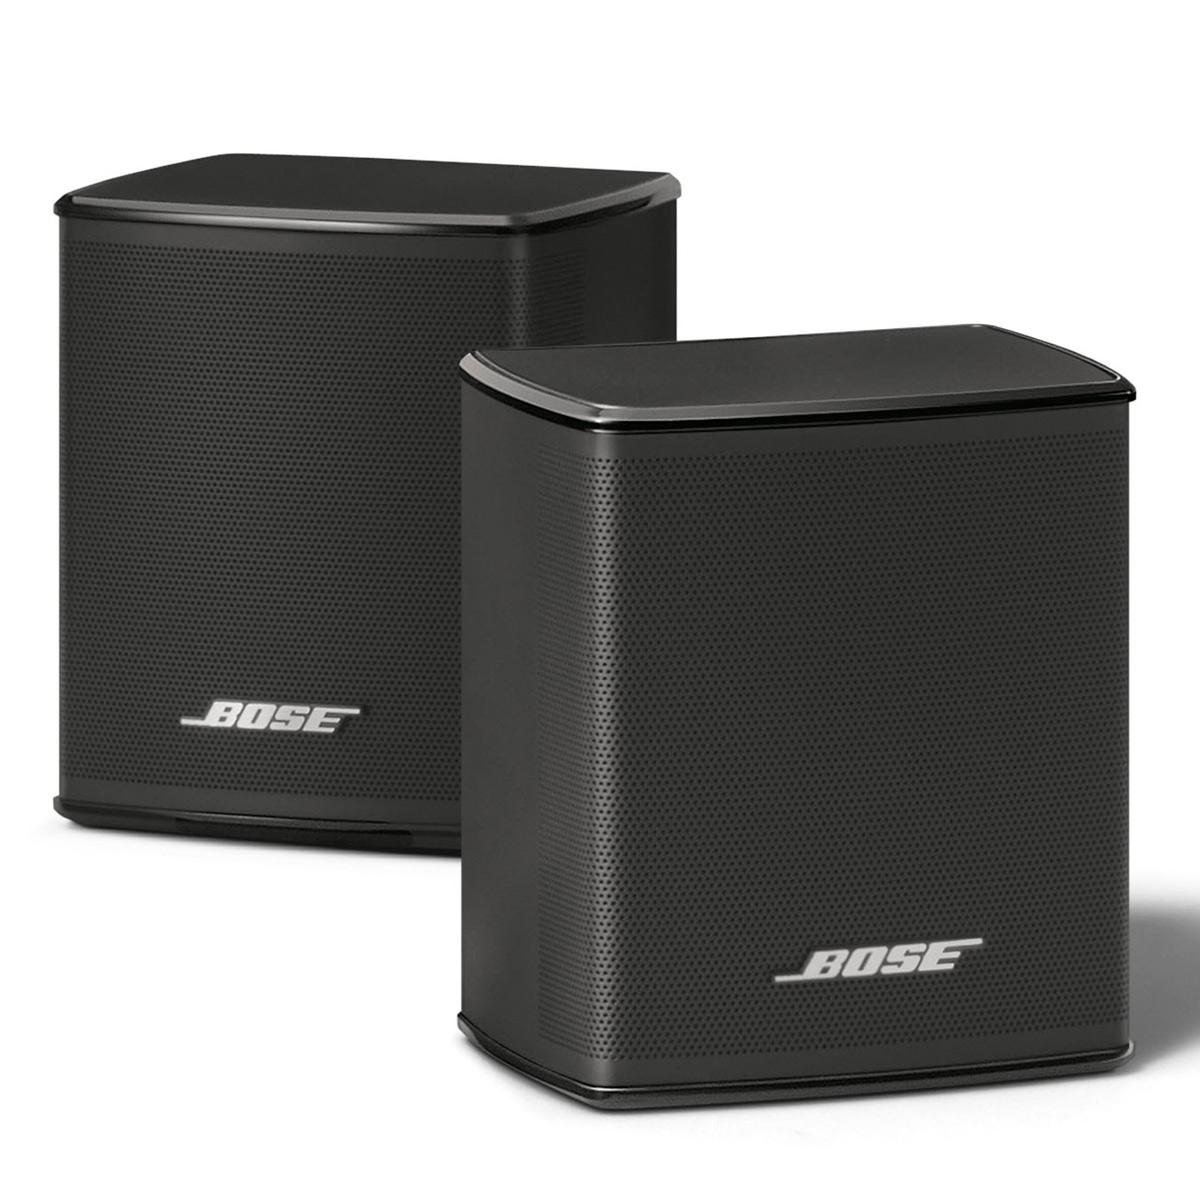 Bose Surround Wireless Speakers - Pair (Black)